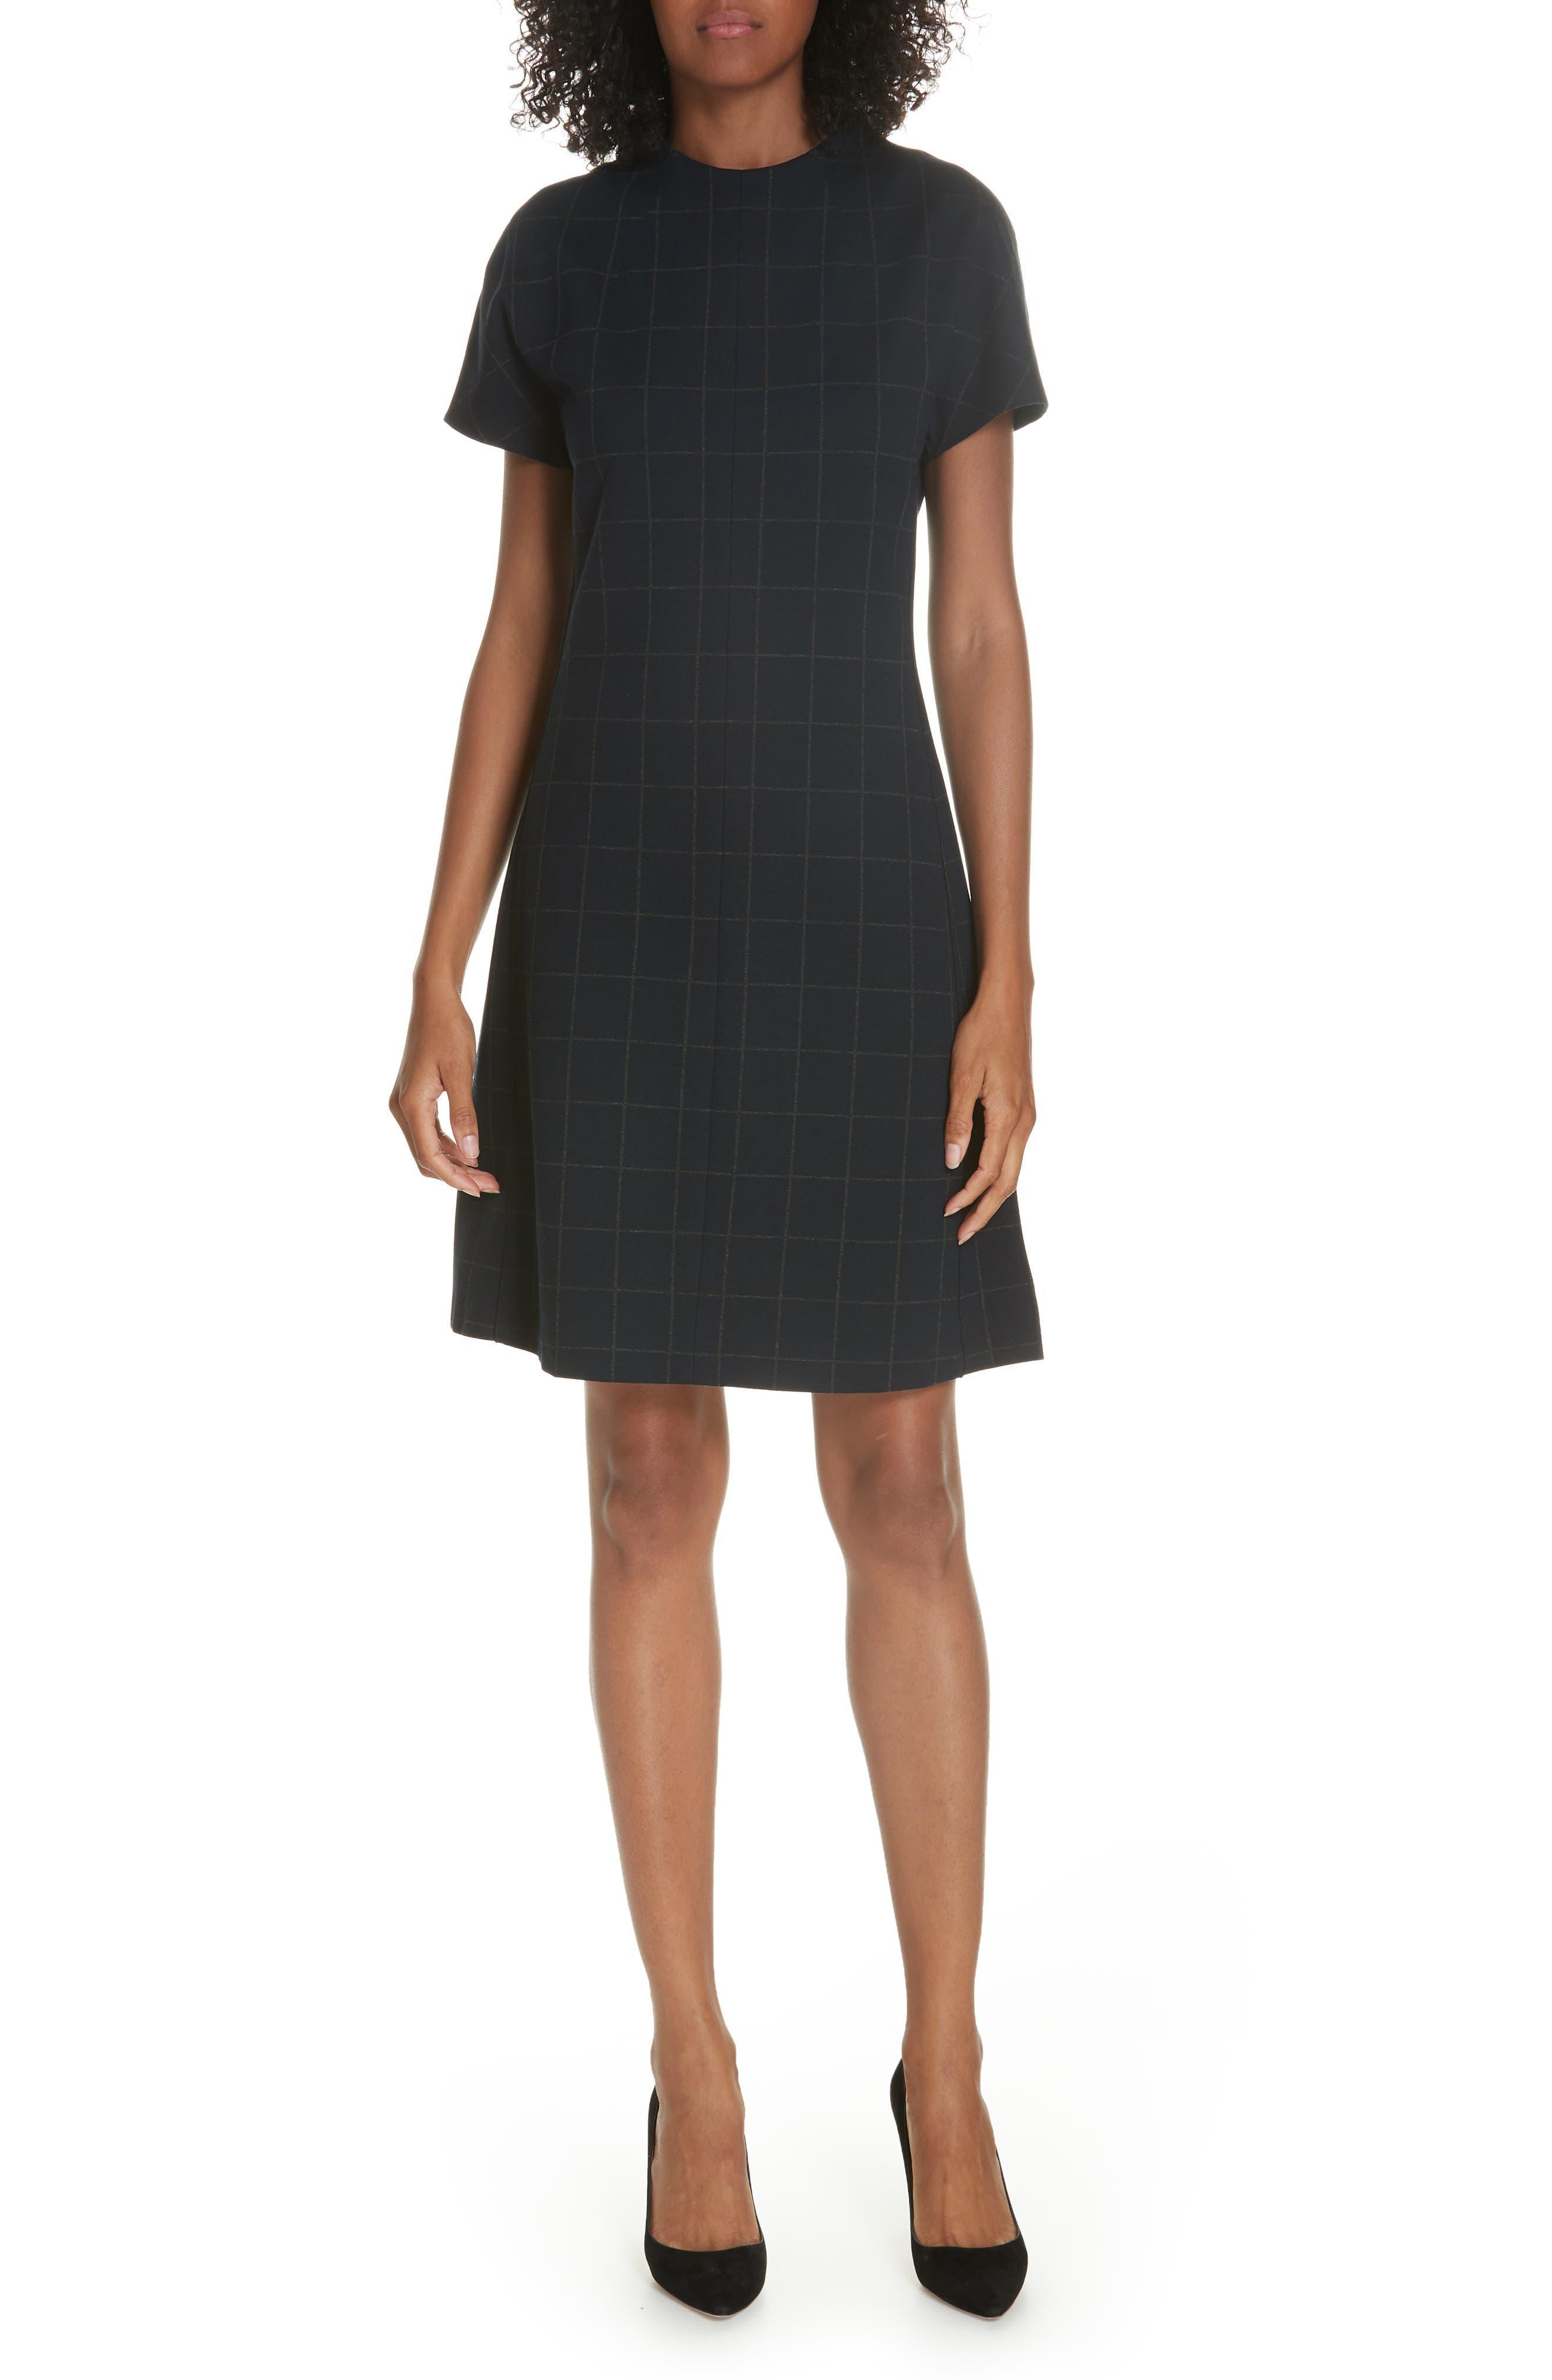 Windowpane Knit A-Line Dress,                             Main thumbnail 1, color,                             DEEP NAVY/ CHARCOAL MELANGE